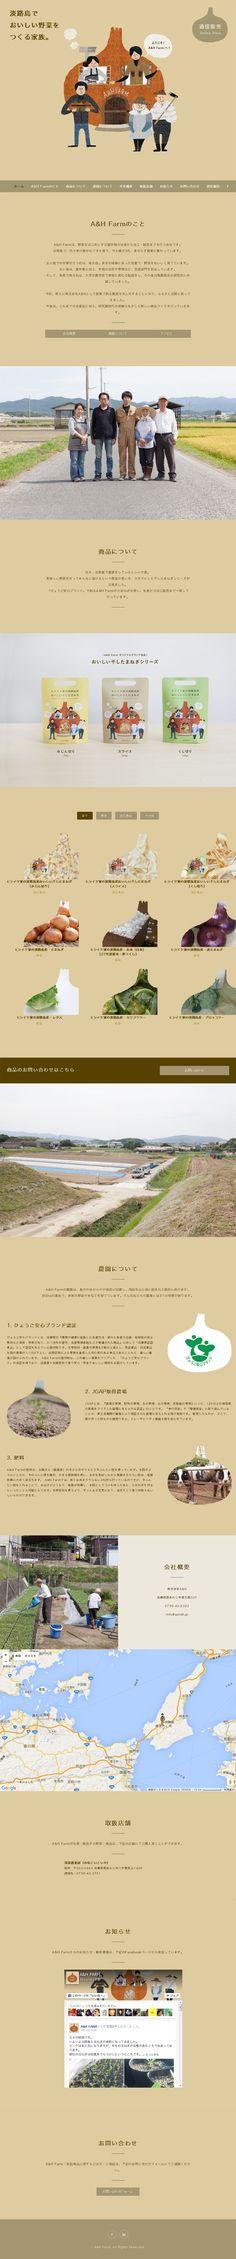 A&H FARM【飲料・お酒関連】のLPデザイン。WEBデザイナーさん必見!ランディングページのデザイン参考に(オーガニック系) Web Japan, Art Web, Web Design Inspiration, Design Ideas, Japanese Design, Site Design, Editorial Design, Banner Design, Packaging Design